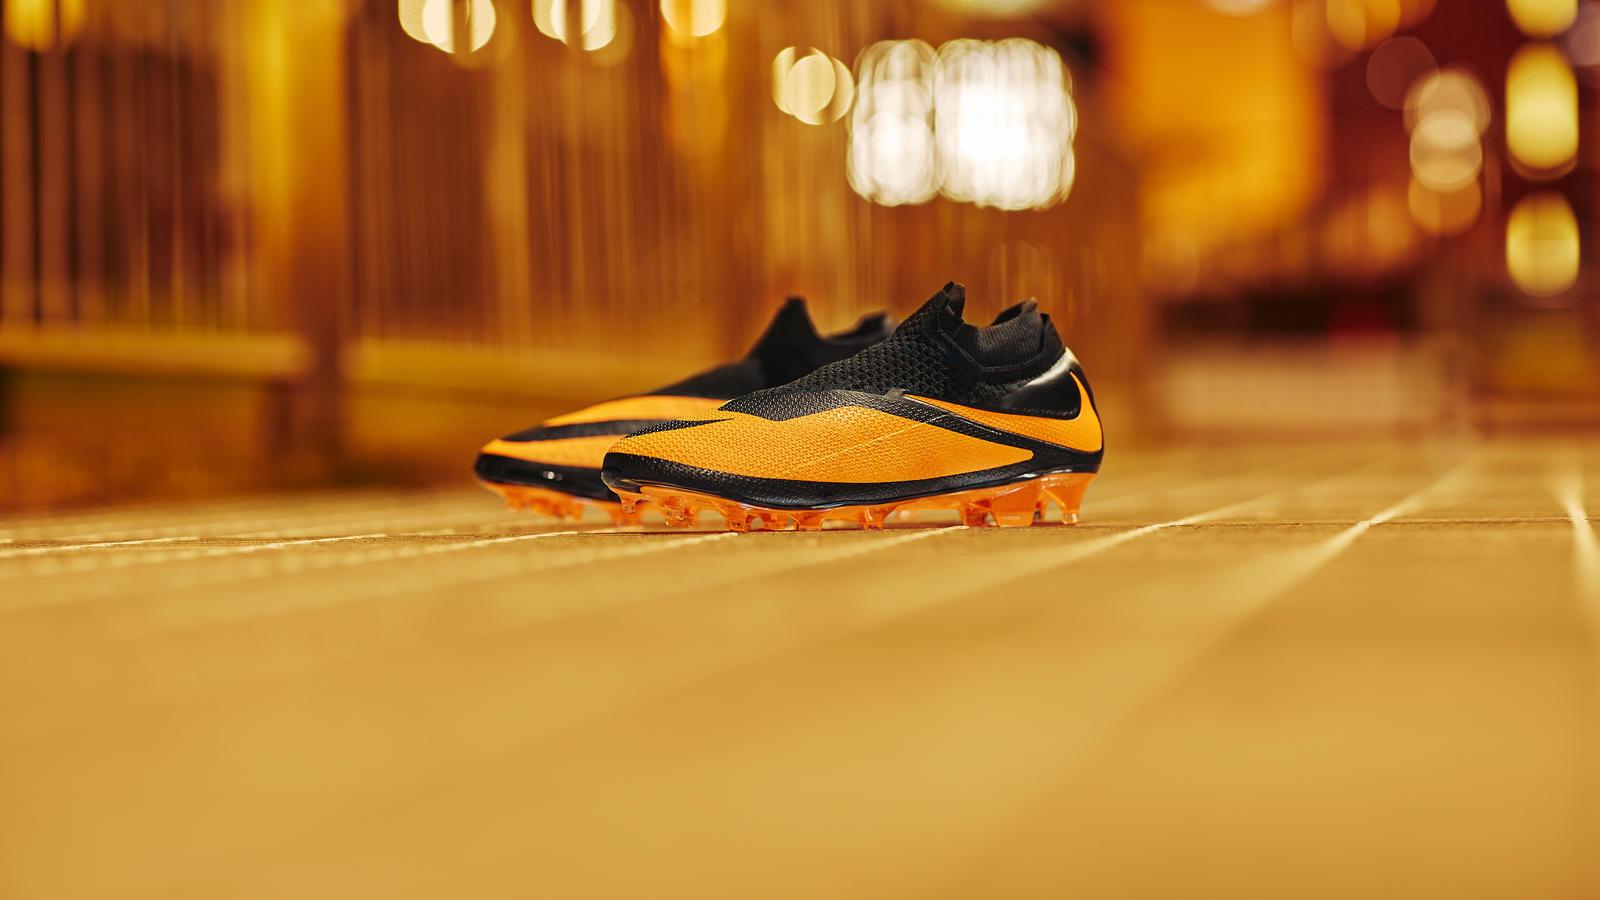 Nike Football Future DNA Pack: Nike Phantom VSN 2 Future DNA Hypervenom 1